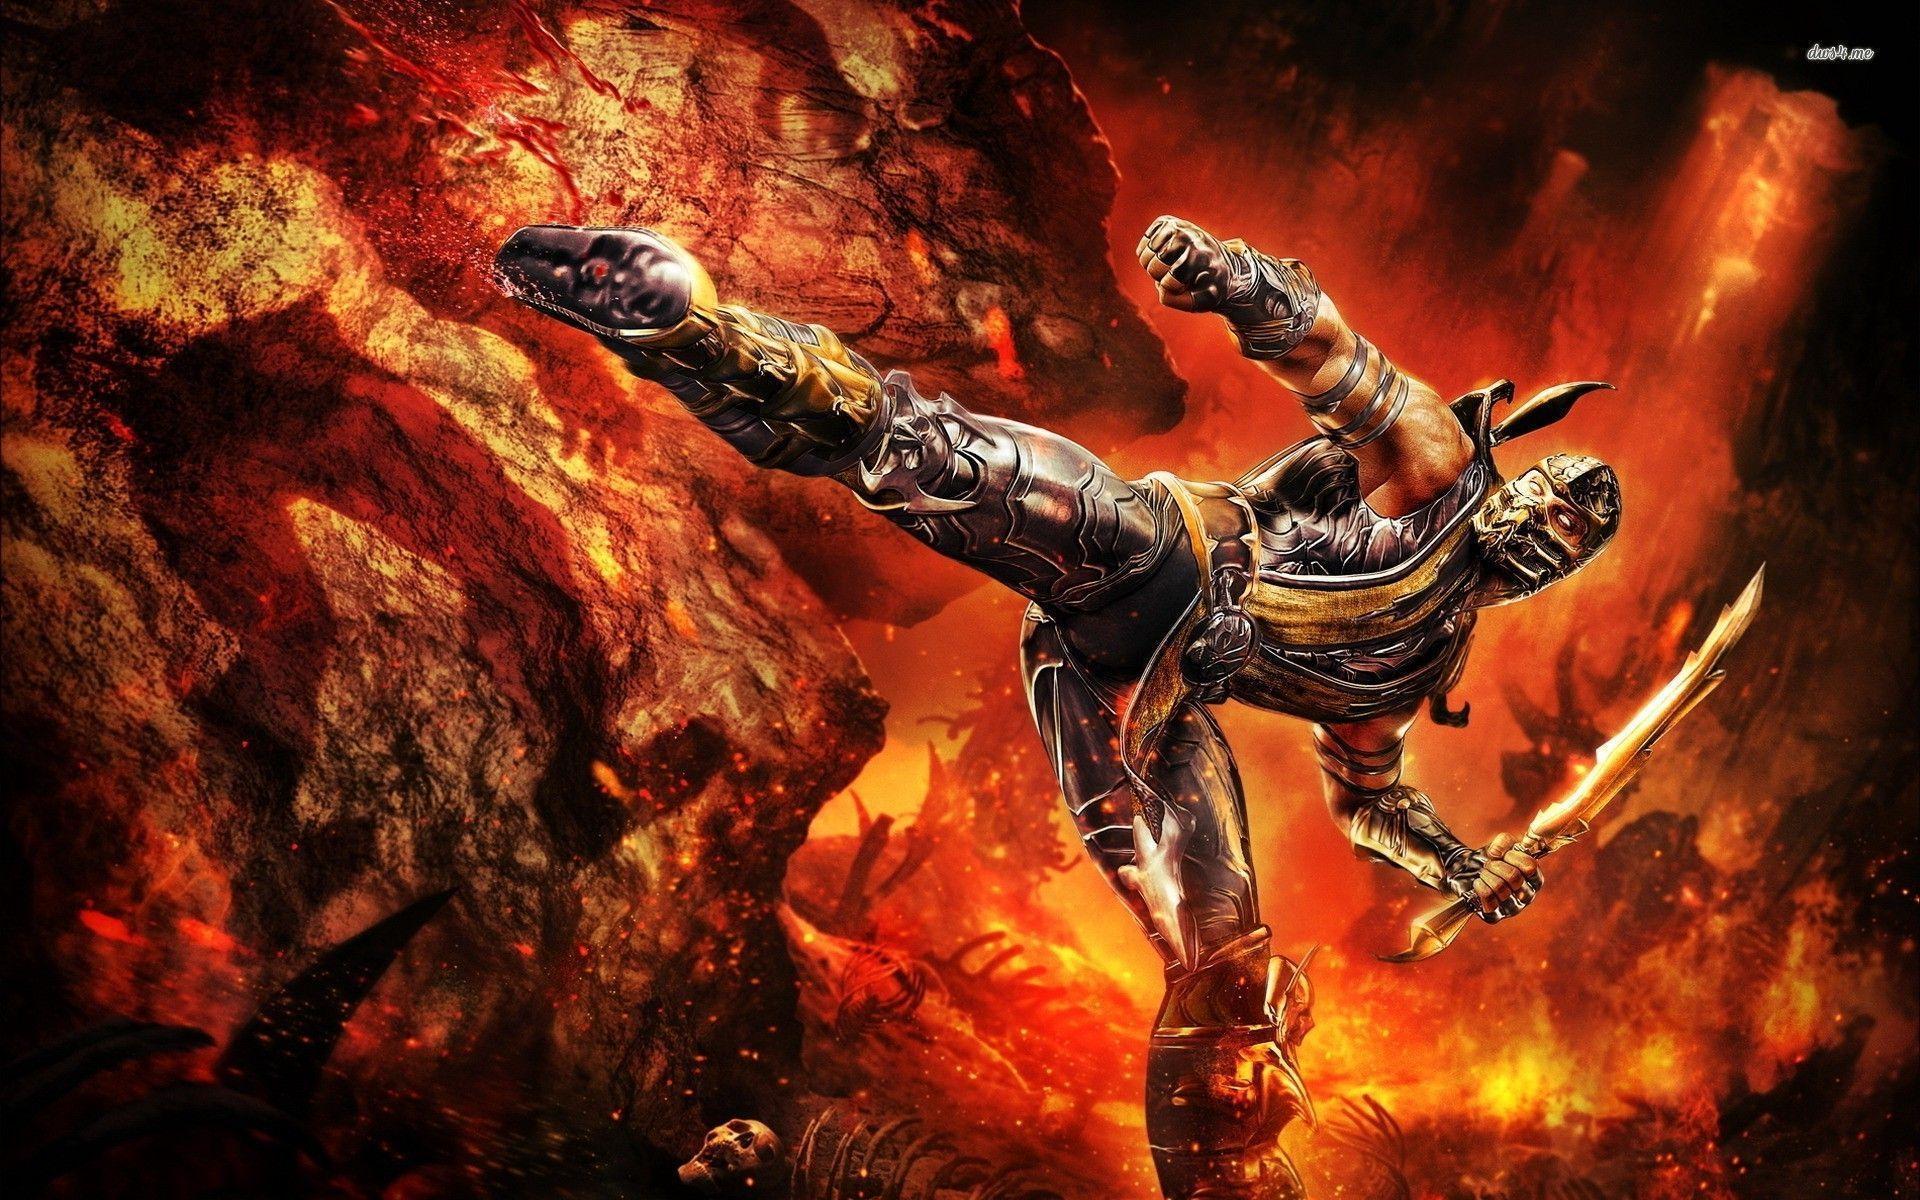 Mortal kombat 9 скорпион